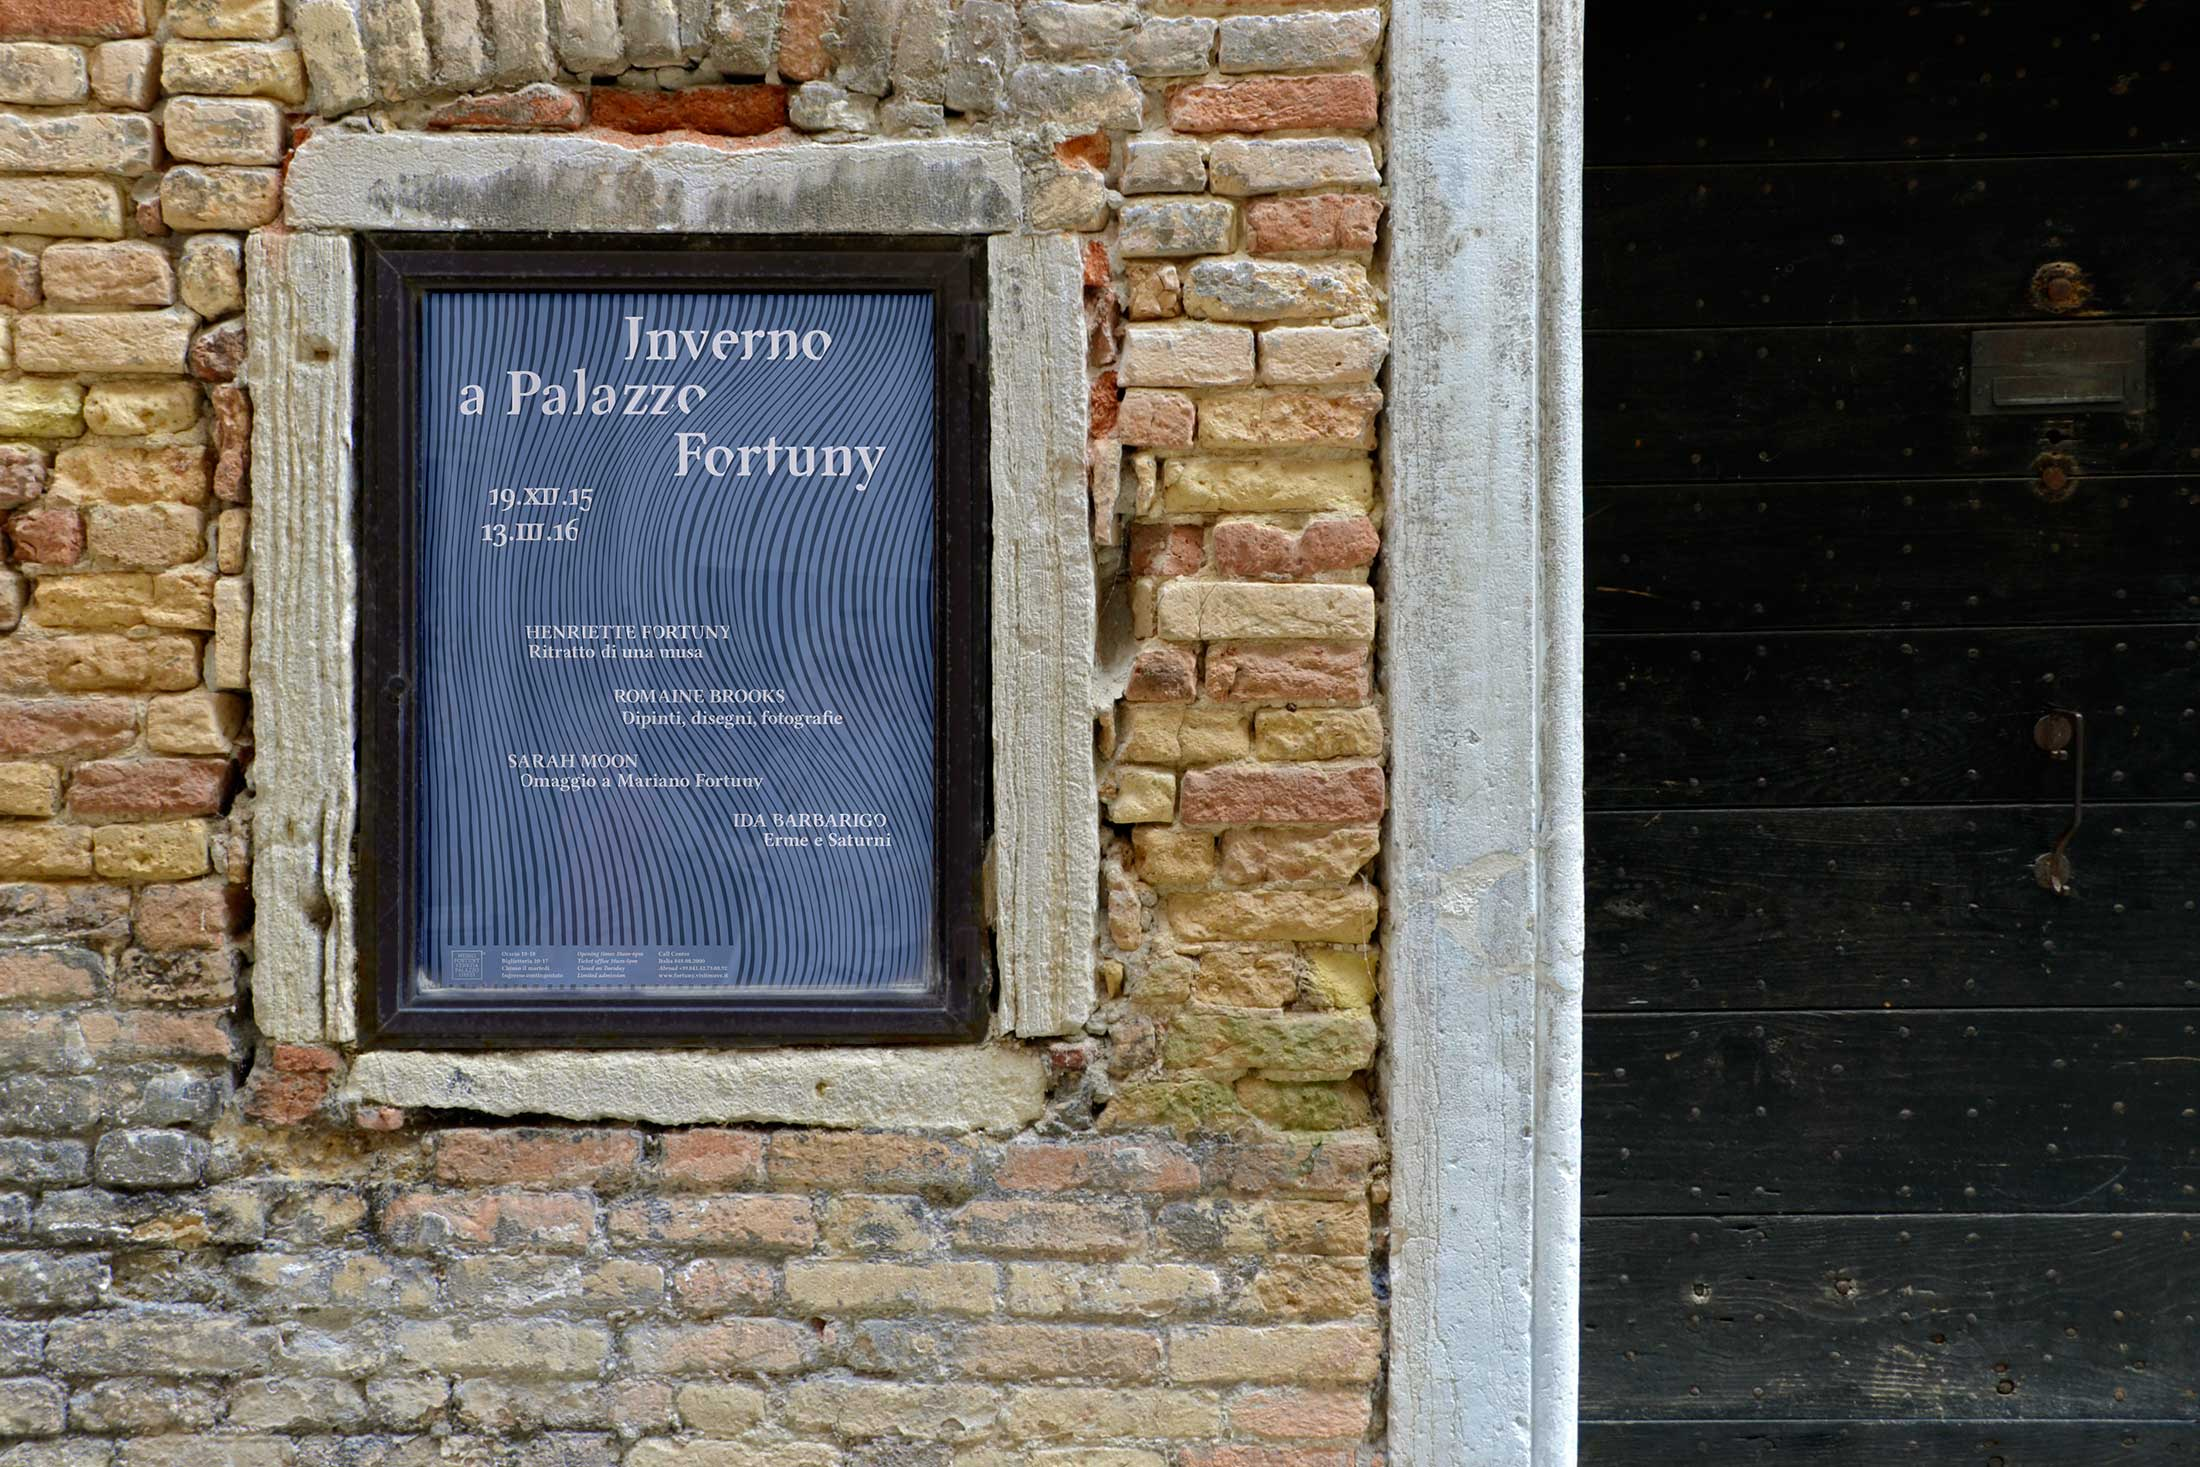 Inverno a Palazzo Fortuny - locandina